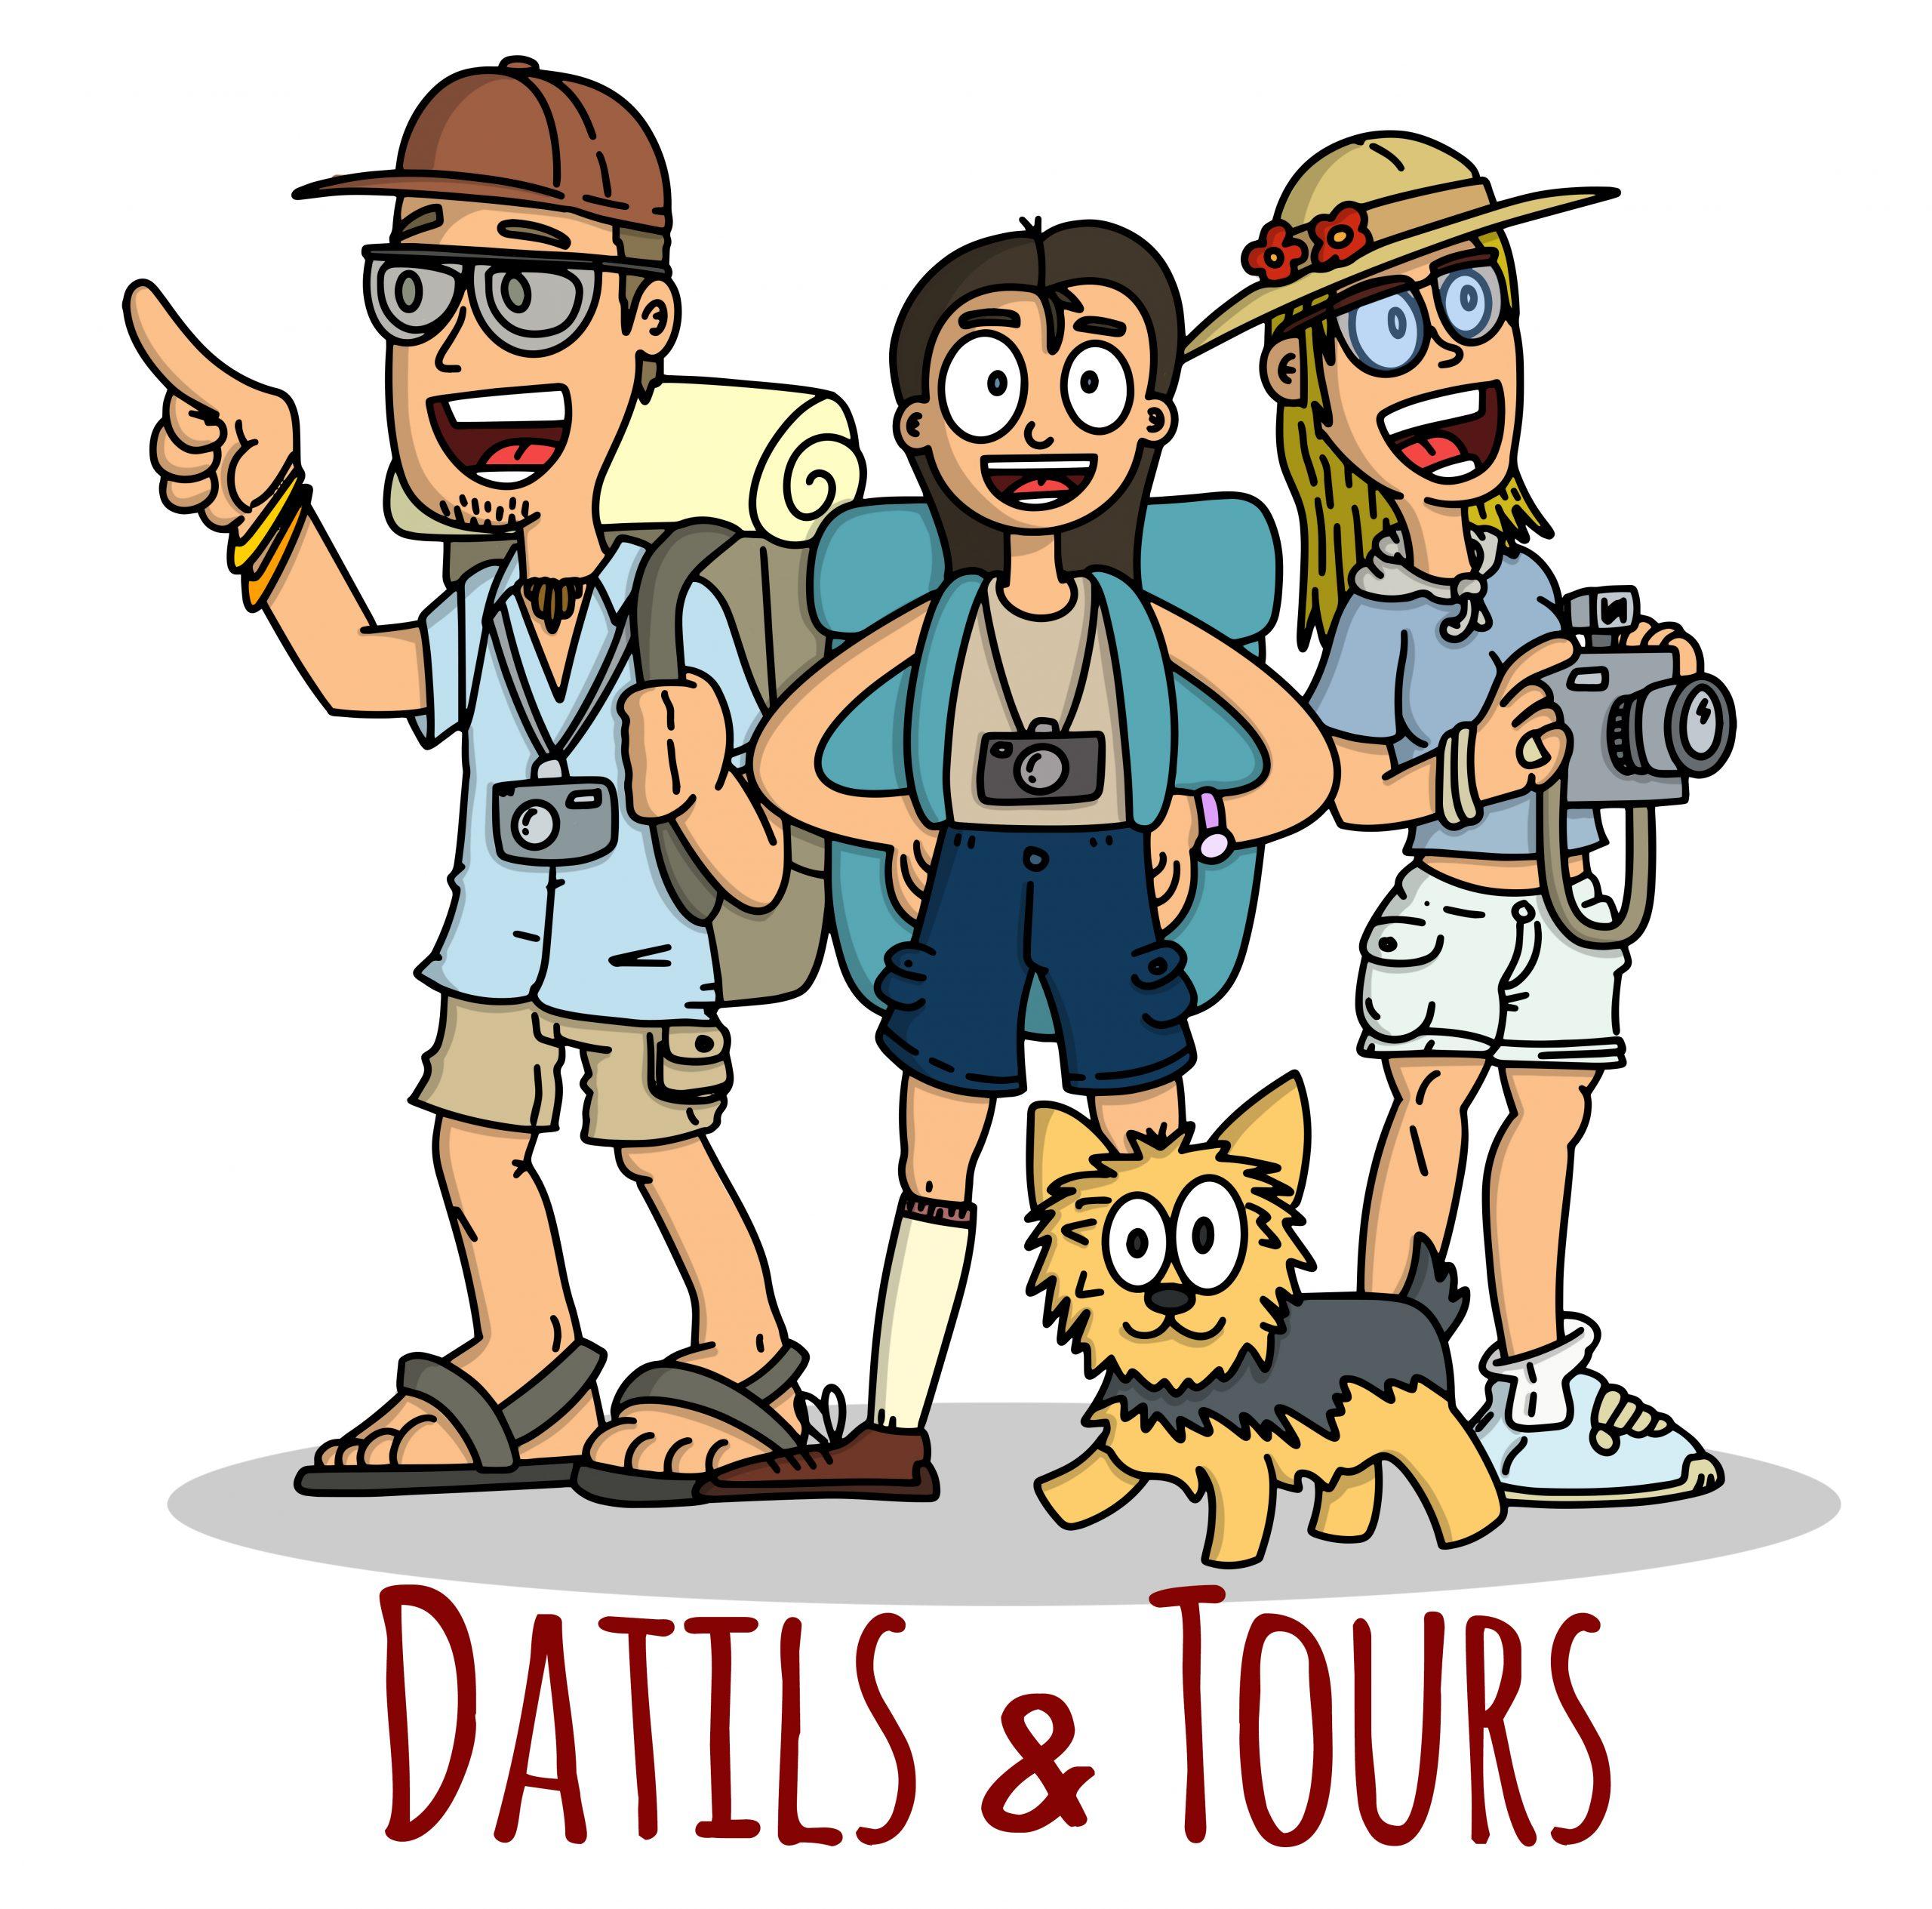 Datils & Tours cambia de imagen